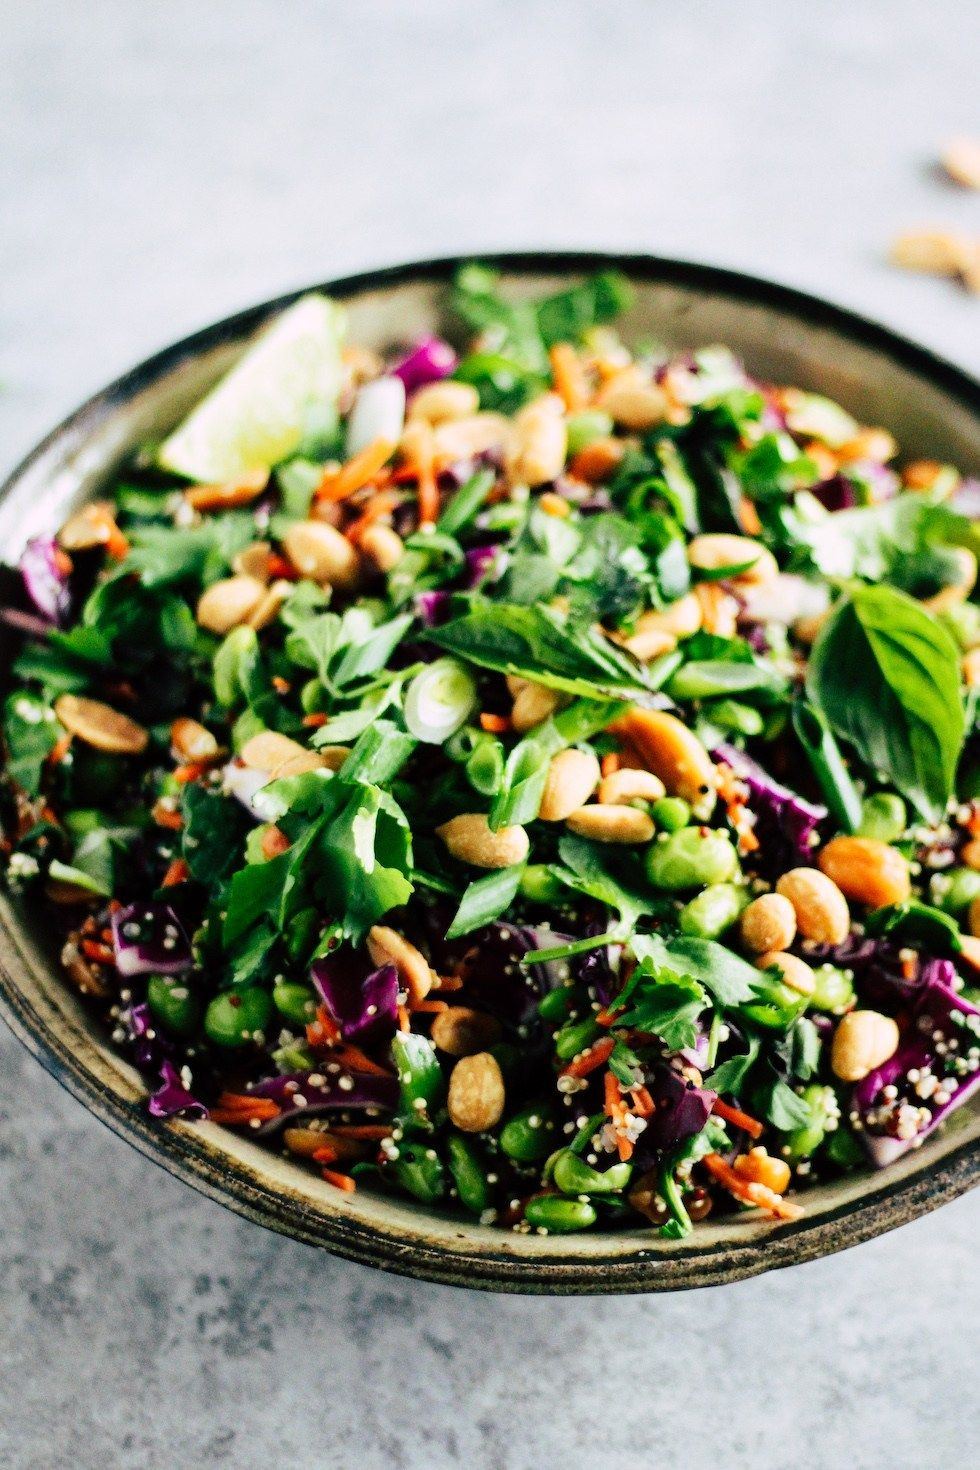 Spicy Edamame Crunch Salad Recipe Edamame Salad Salad Recipes